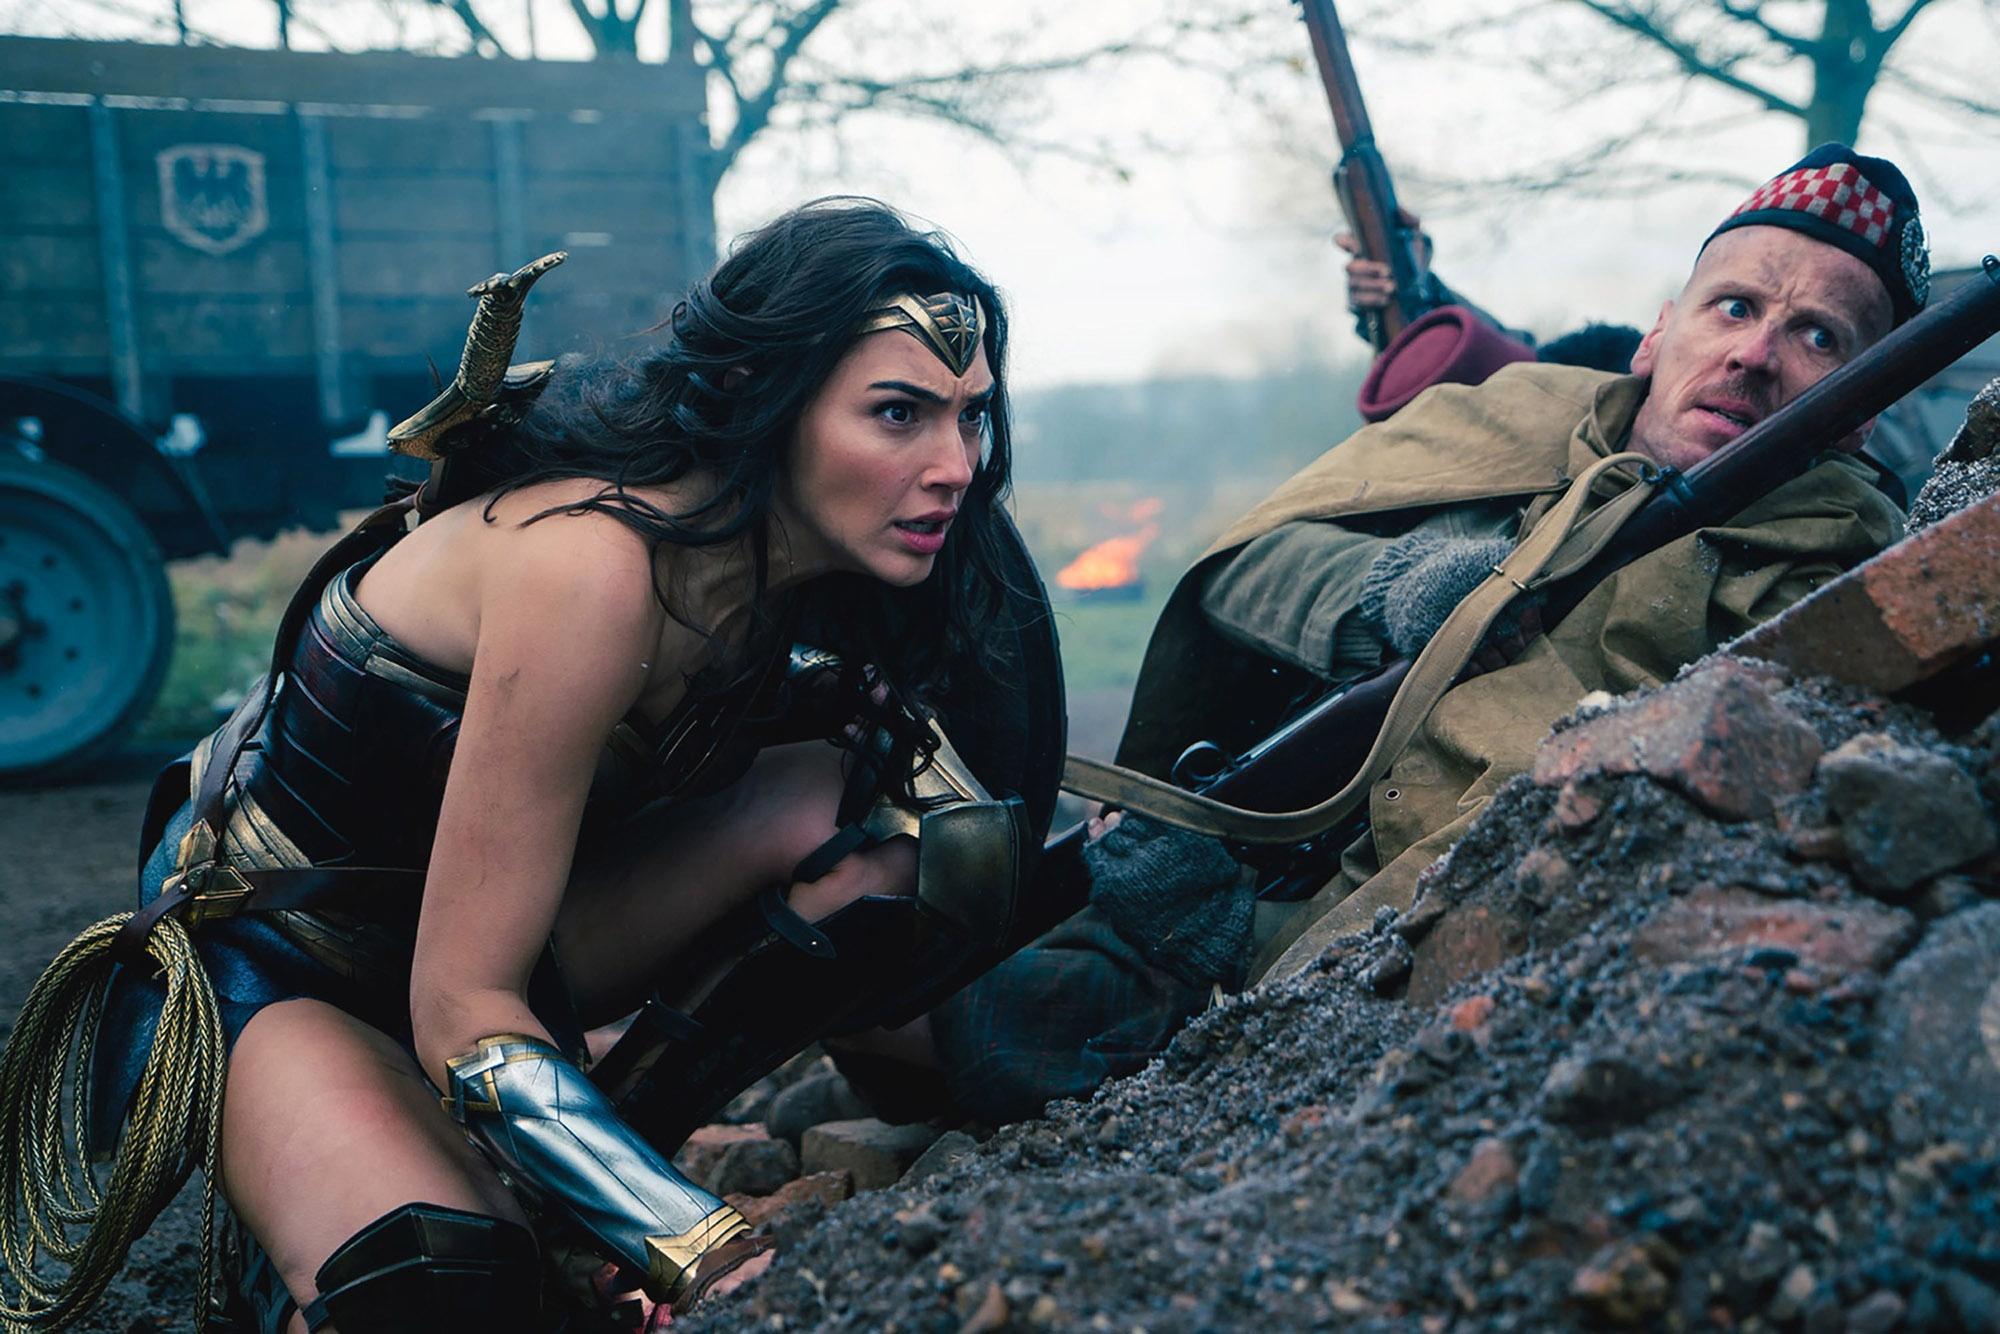 review phim Wonder Woman anh 5